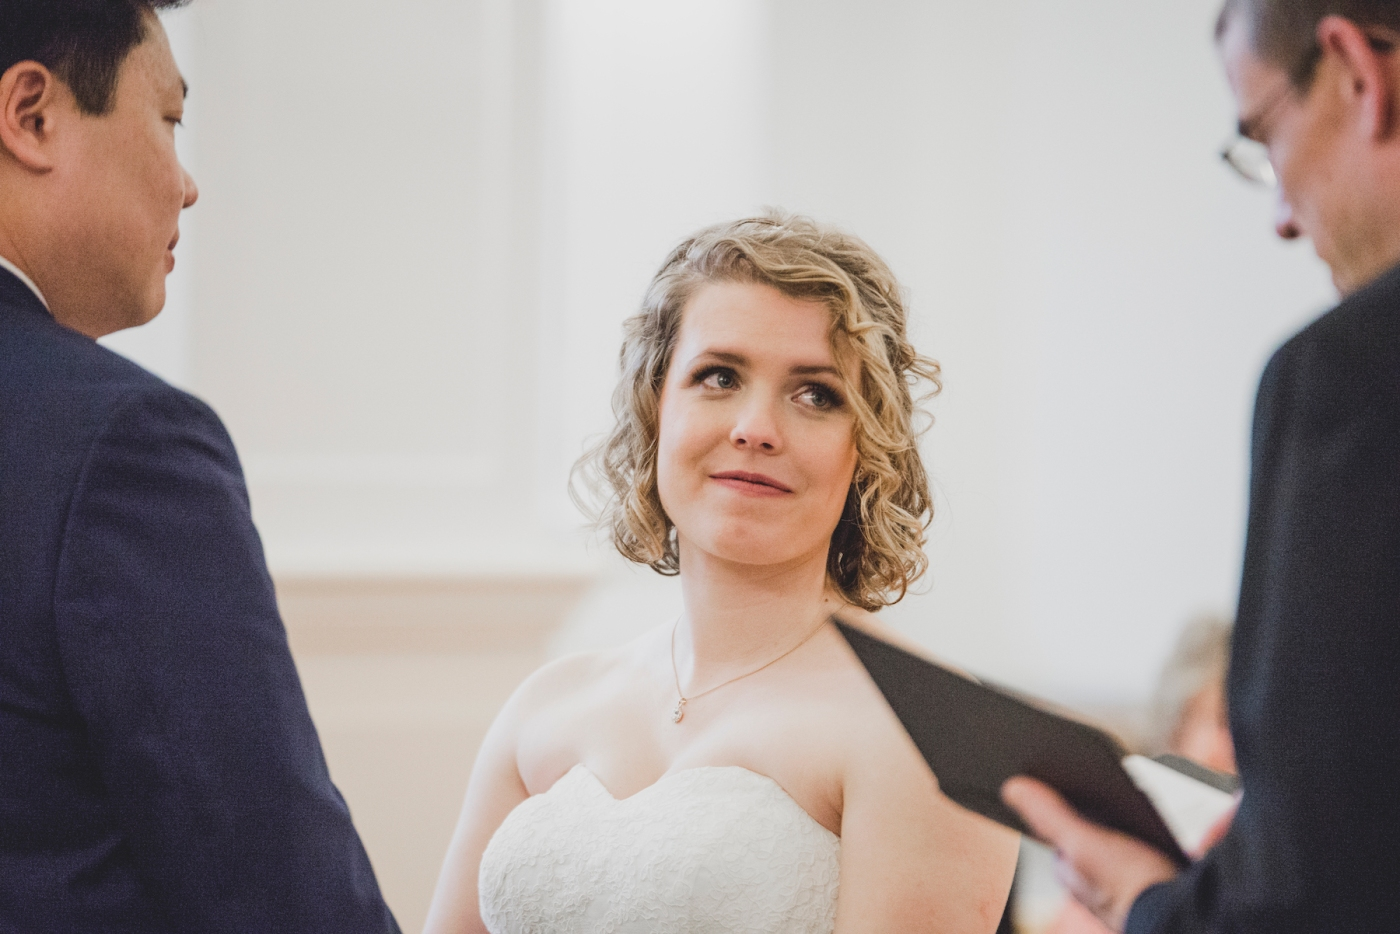 DSC_2659Everett_Wedding_Ballroom_Jane_Speleers_photography_Rachel_and_Edmund_Ceremony_2017